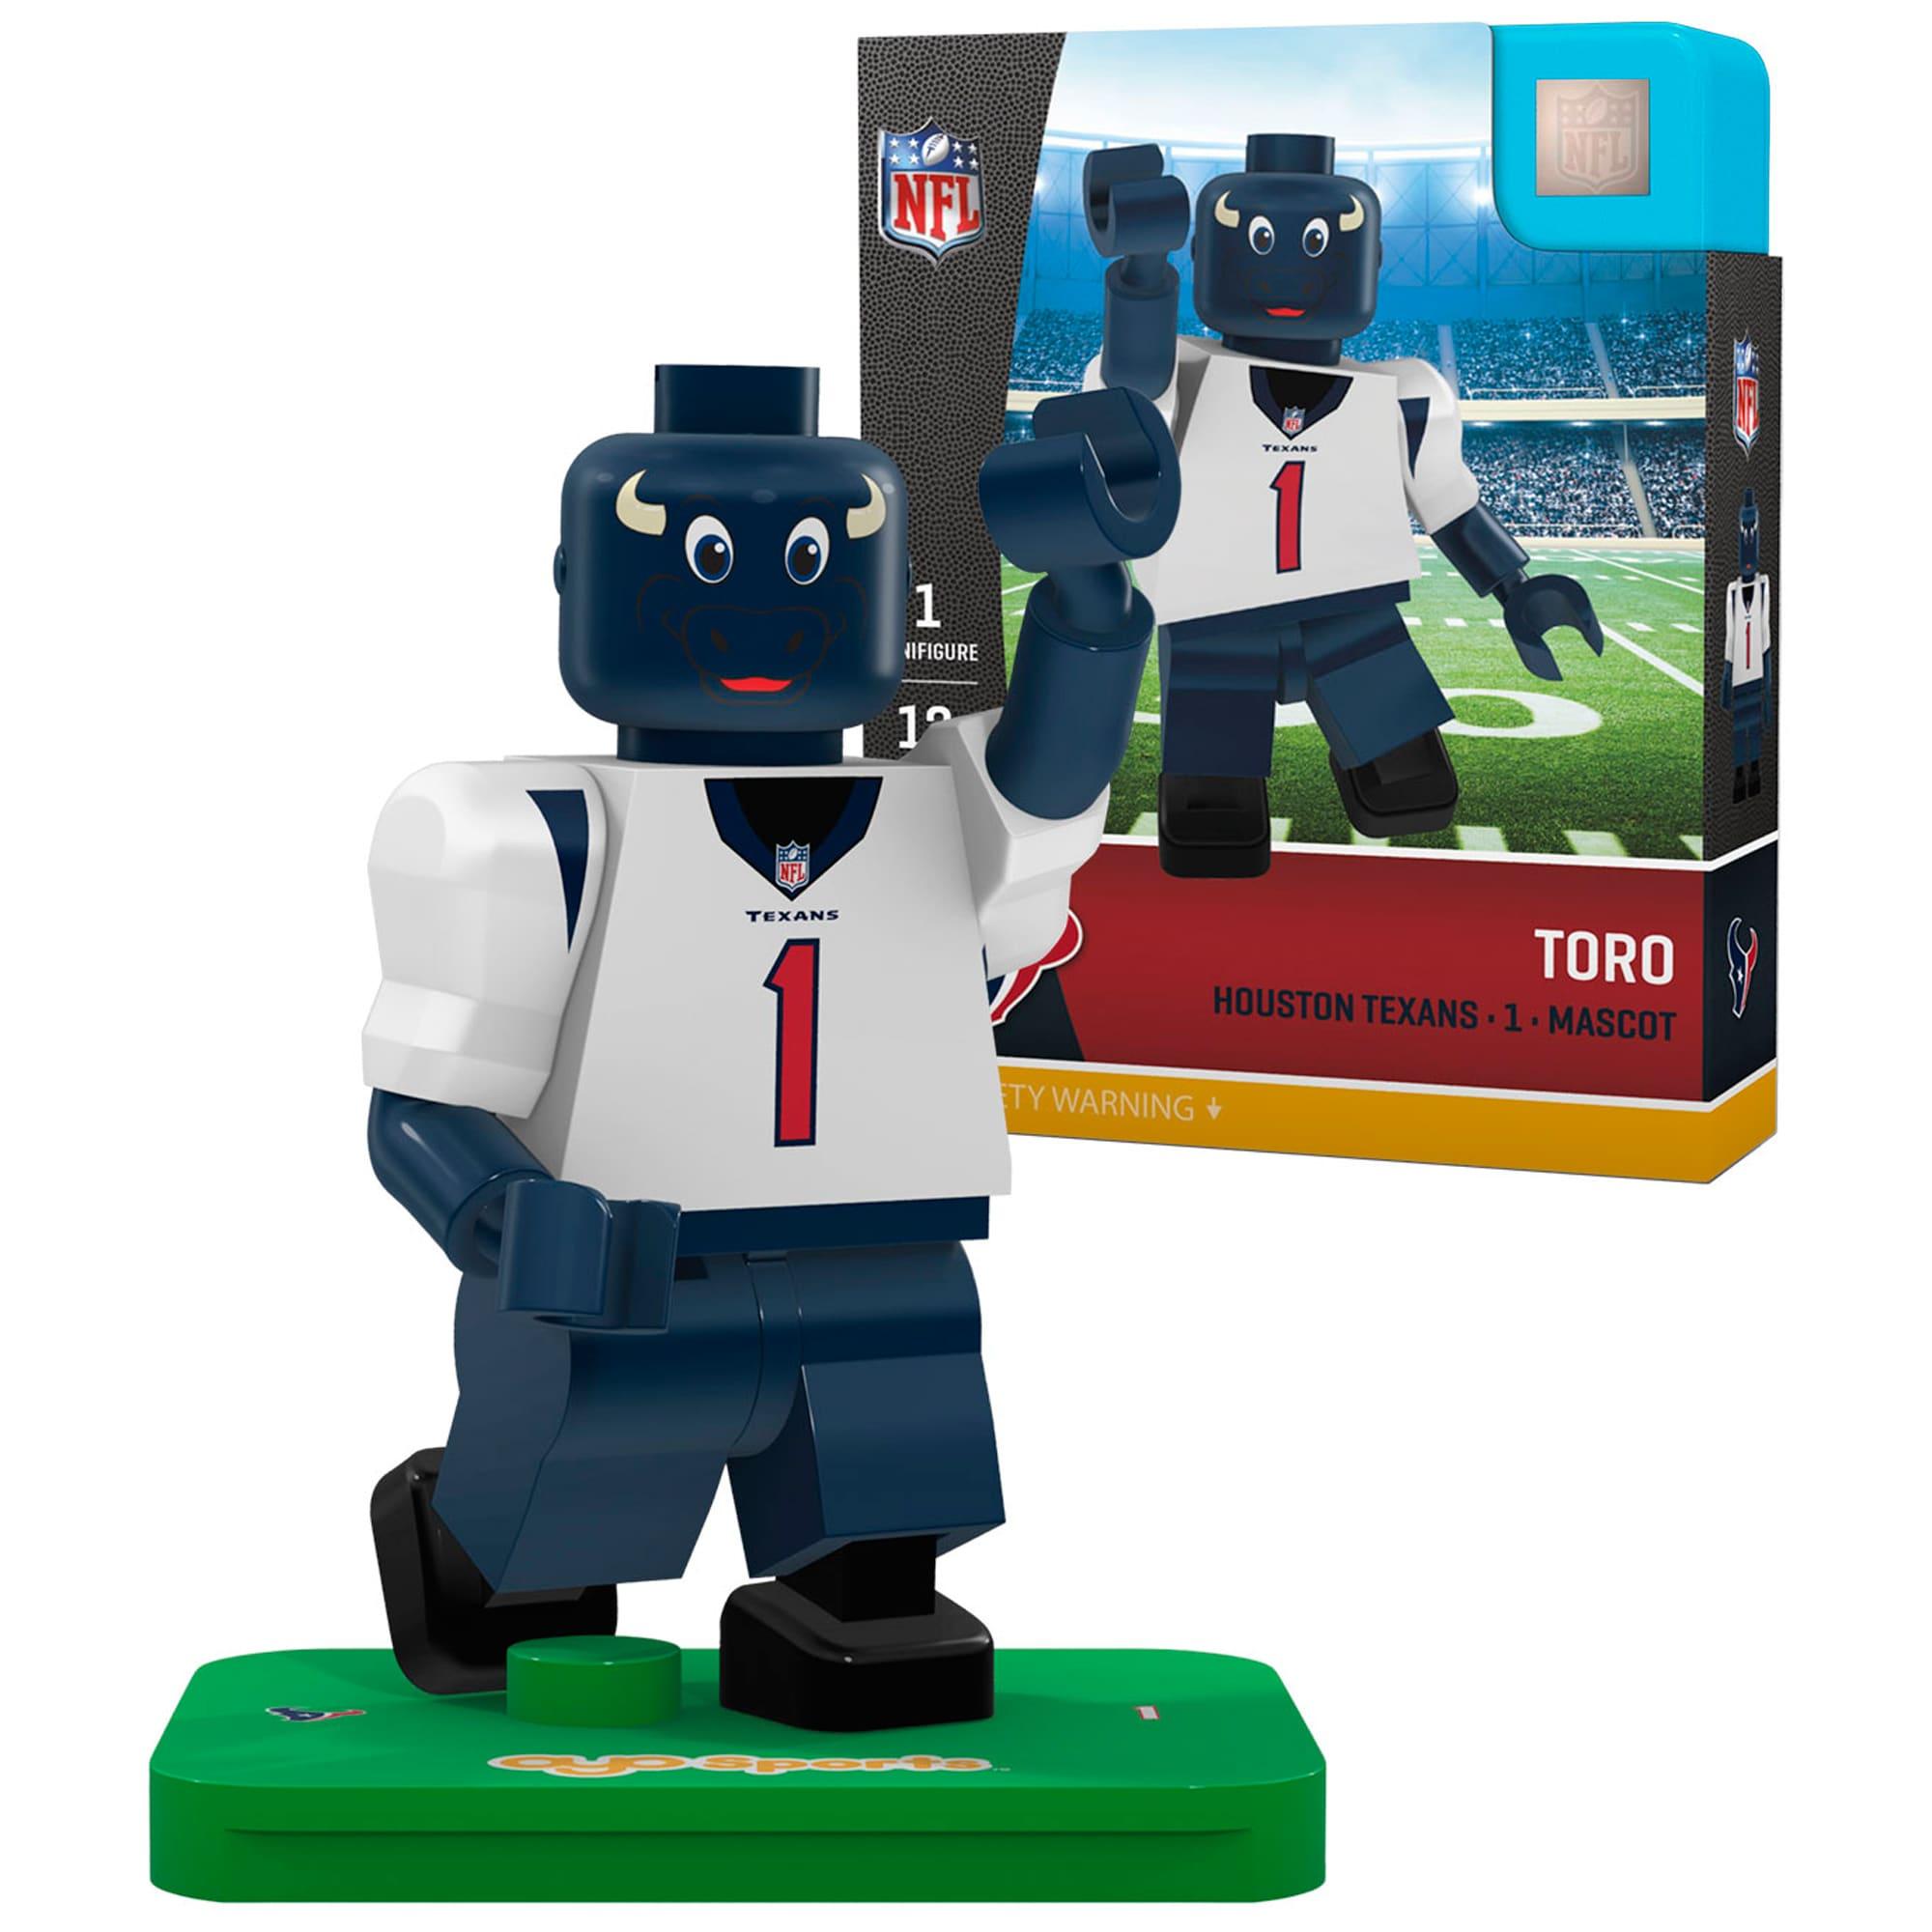 Toro Houston Texans OYO Sports Generation 5 Mascot Minifigure